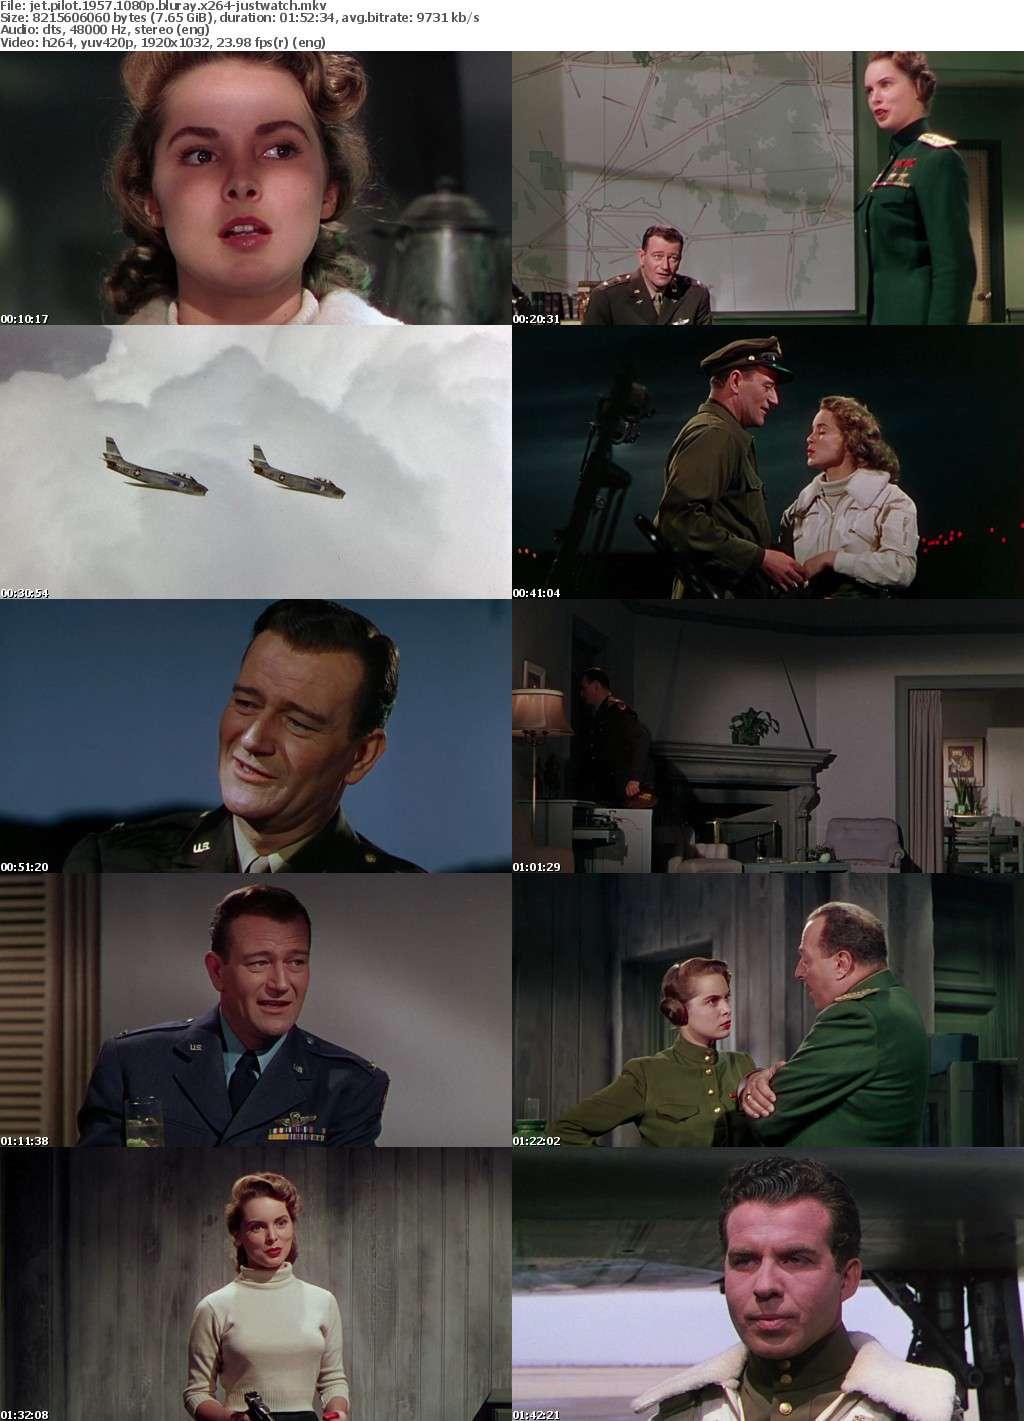 Jet Pilot 1957 1080p BluRay x264-JustWatch